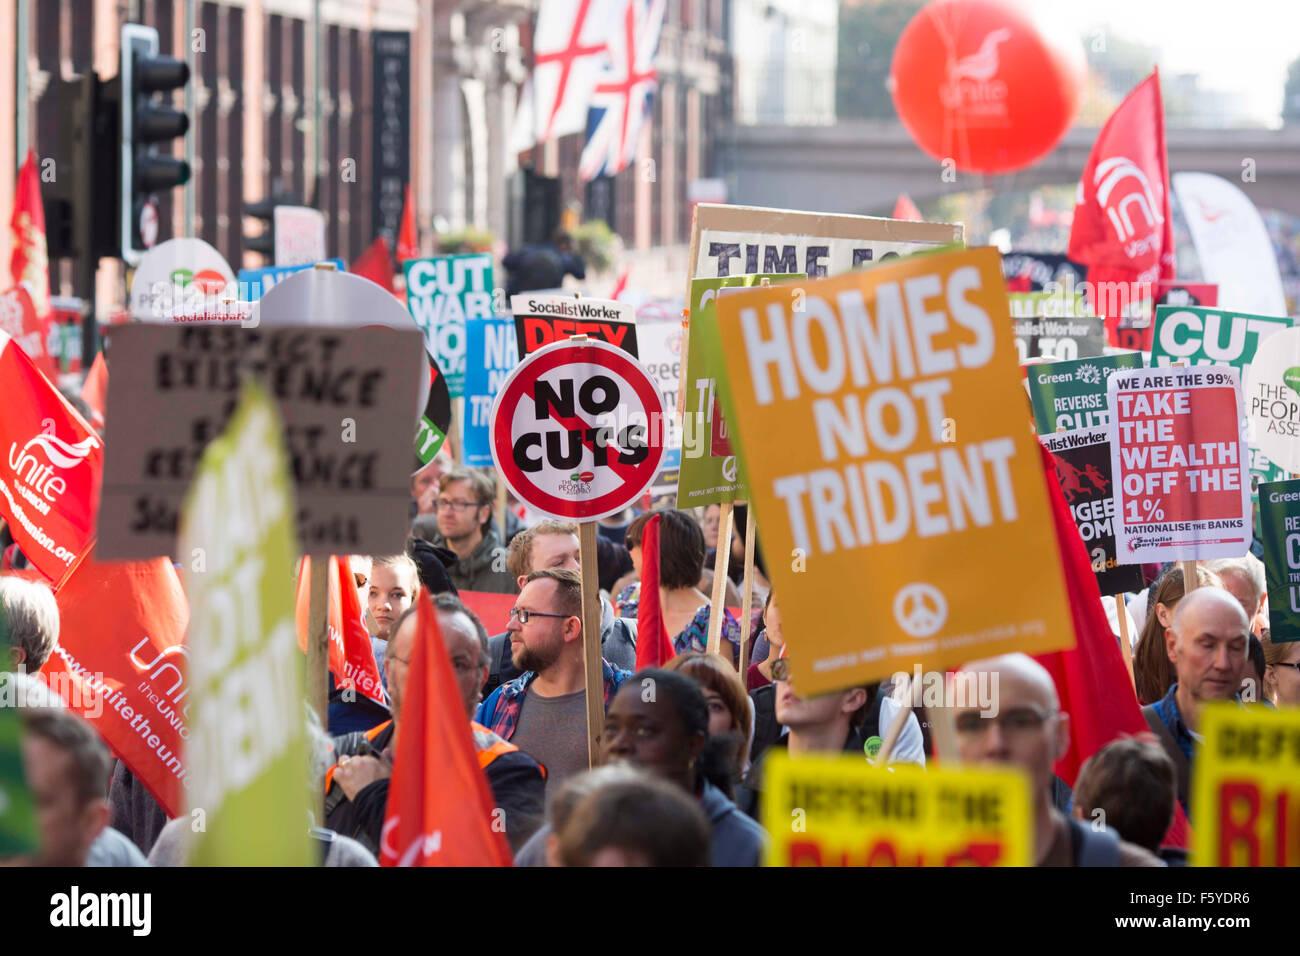 Manchester gegen Sparpolitik Protestkundgebung Stockbild